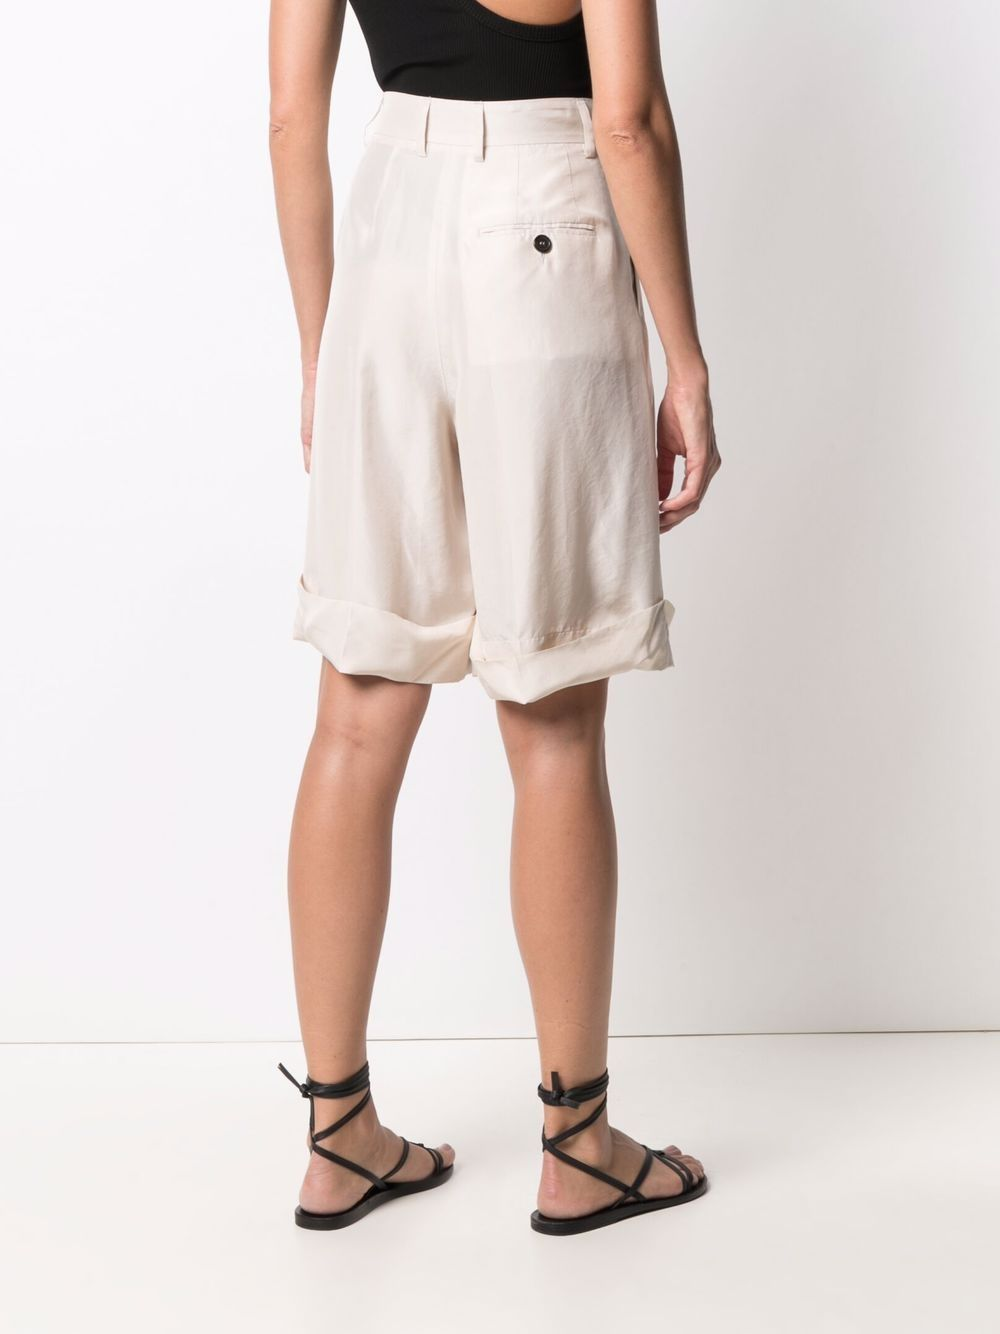 Beige silk knee length shorts  A.B. |  | ABH001-V1211220